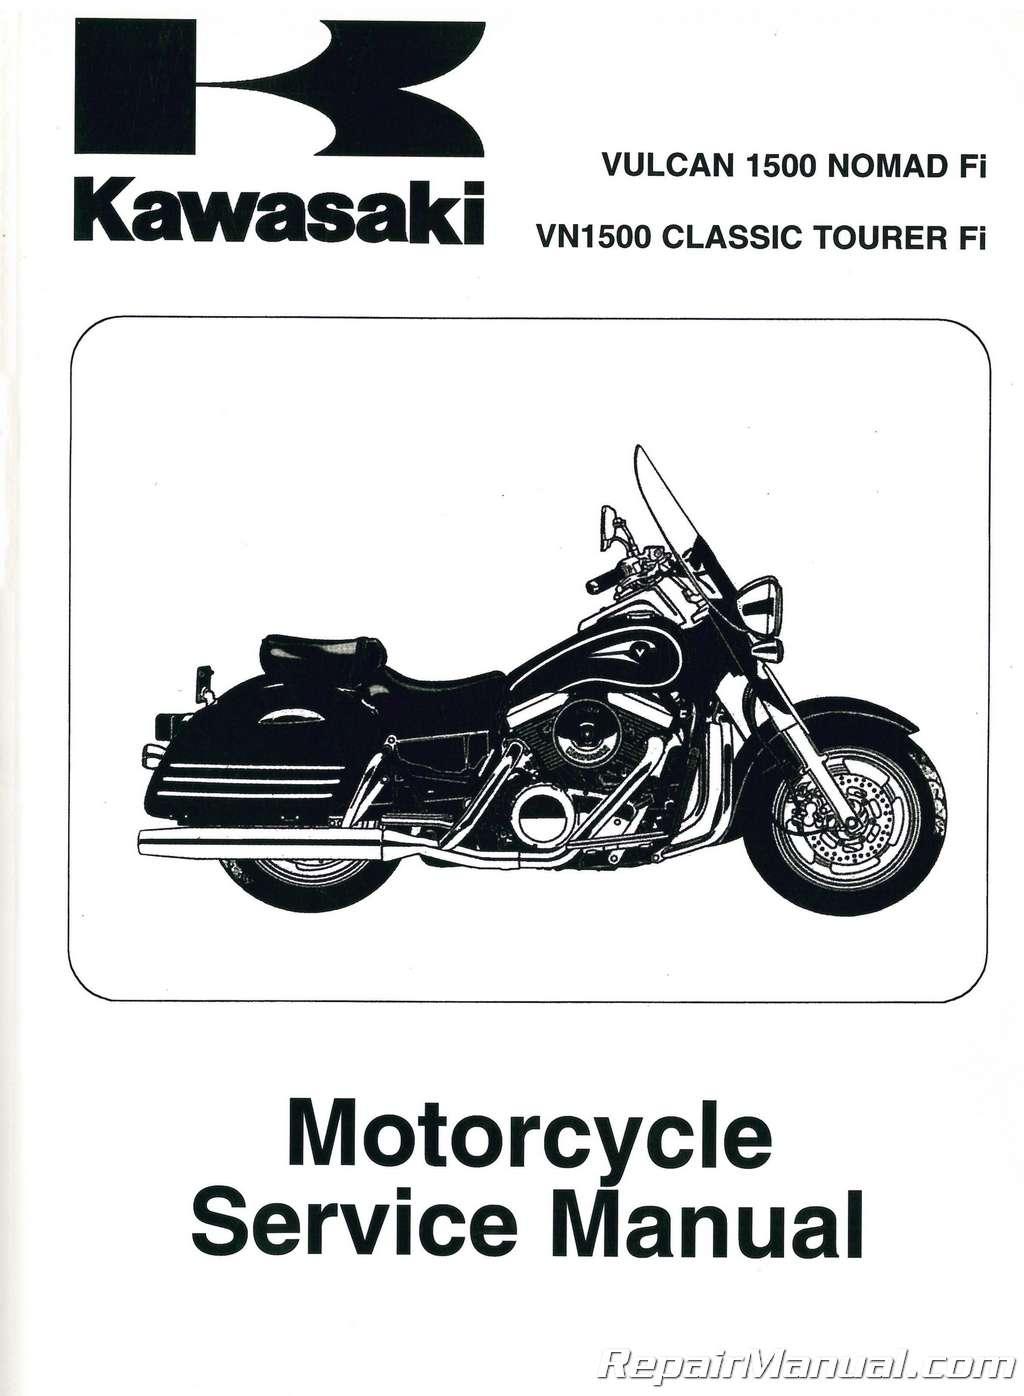 Kawasaki z1100 manual on